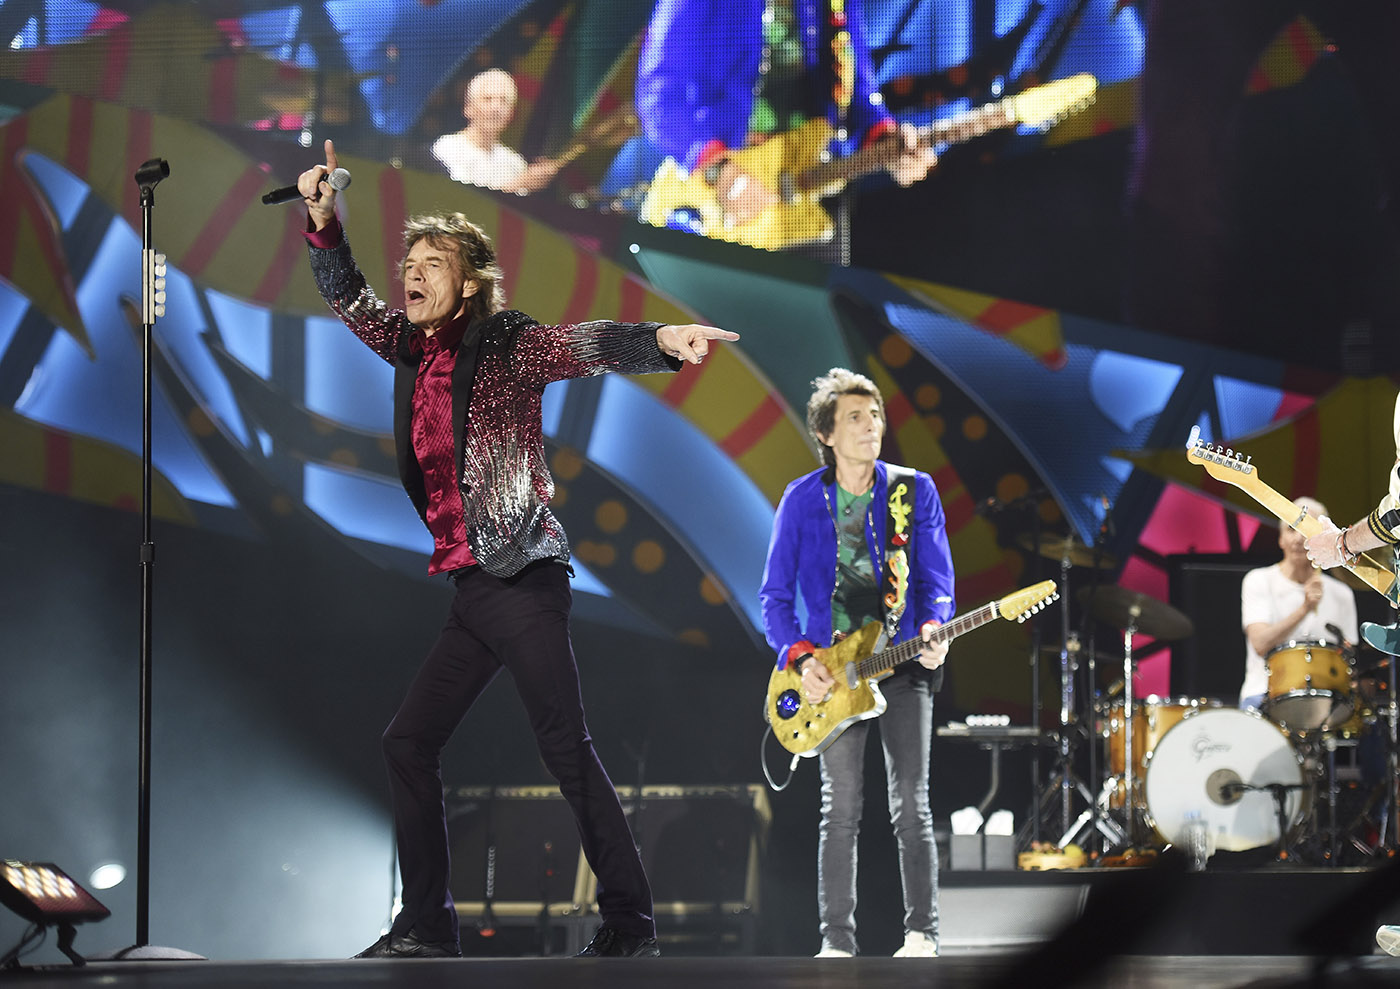 The Rolling Stones Concert in Cuba